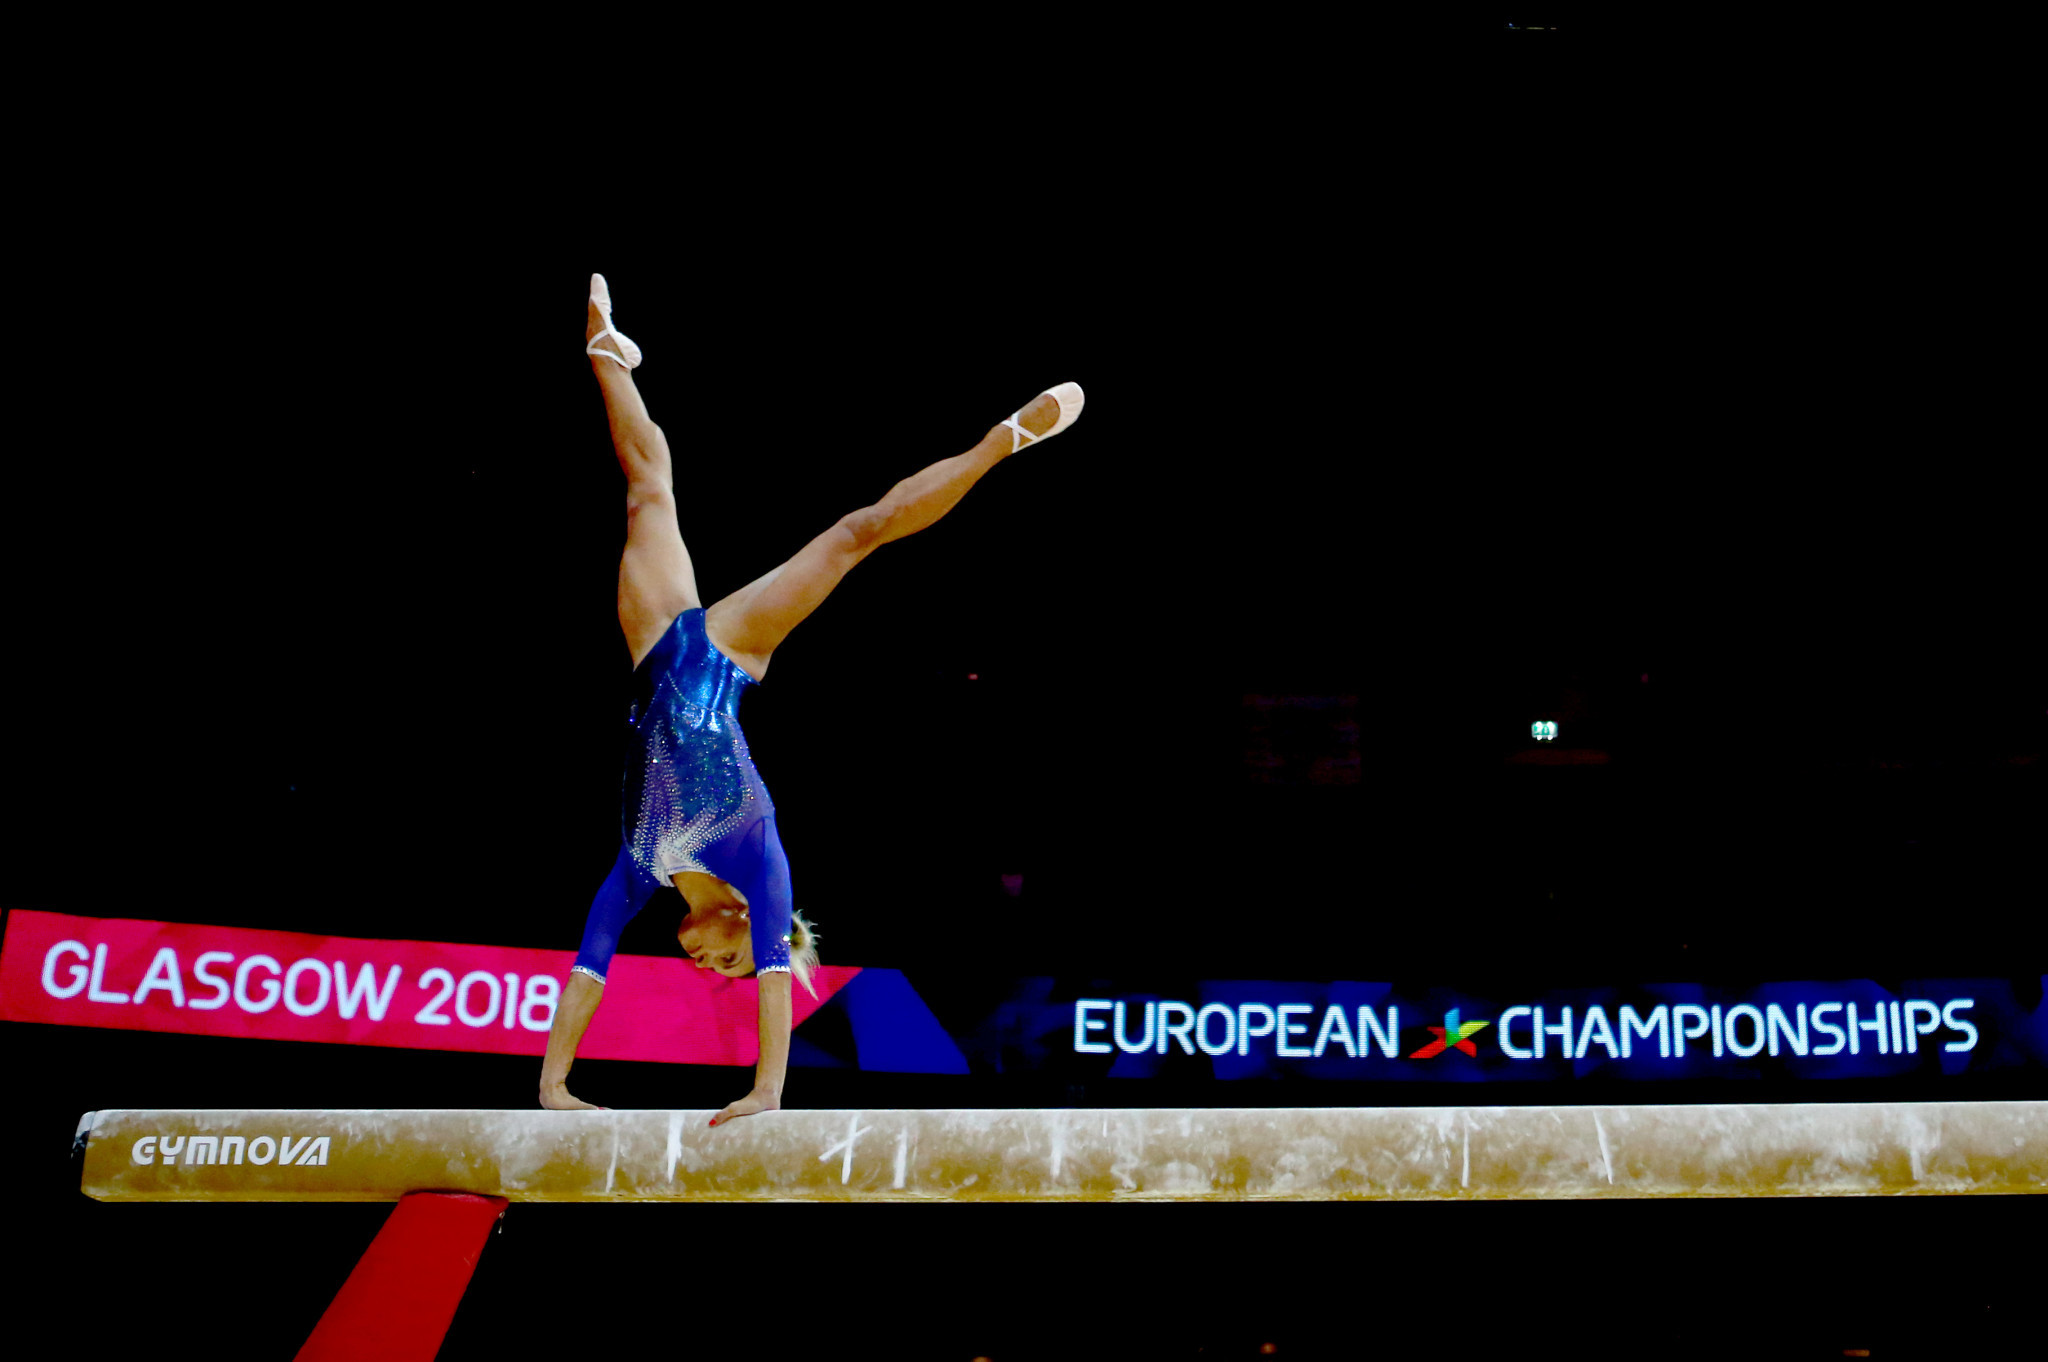 Brand new European Championships open in Glasgow